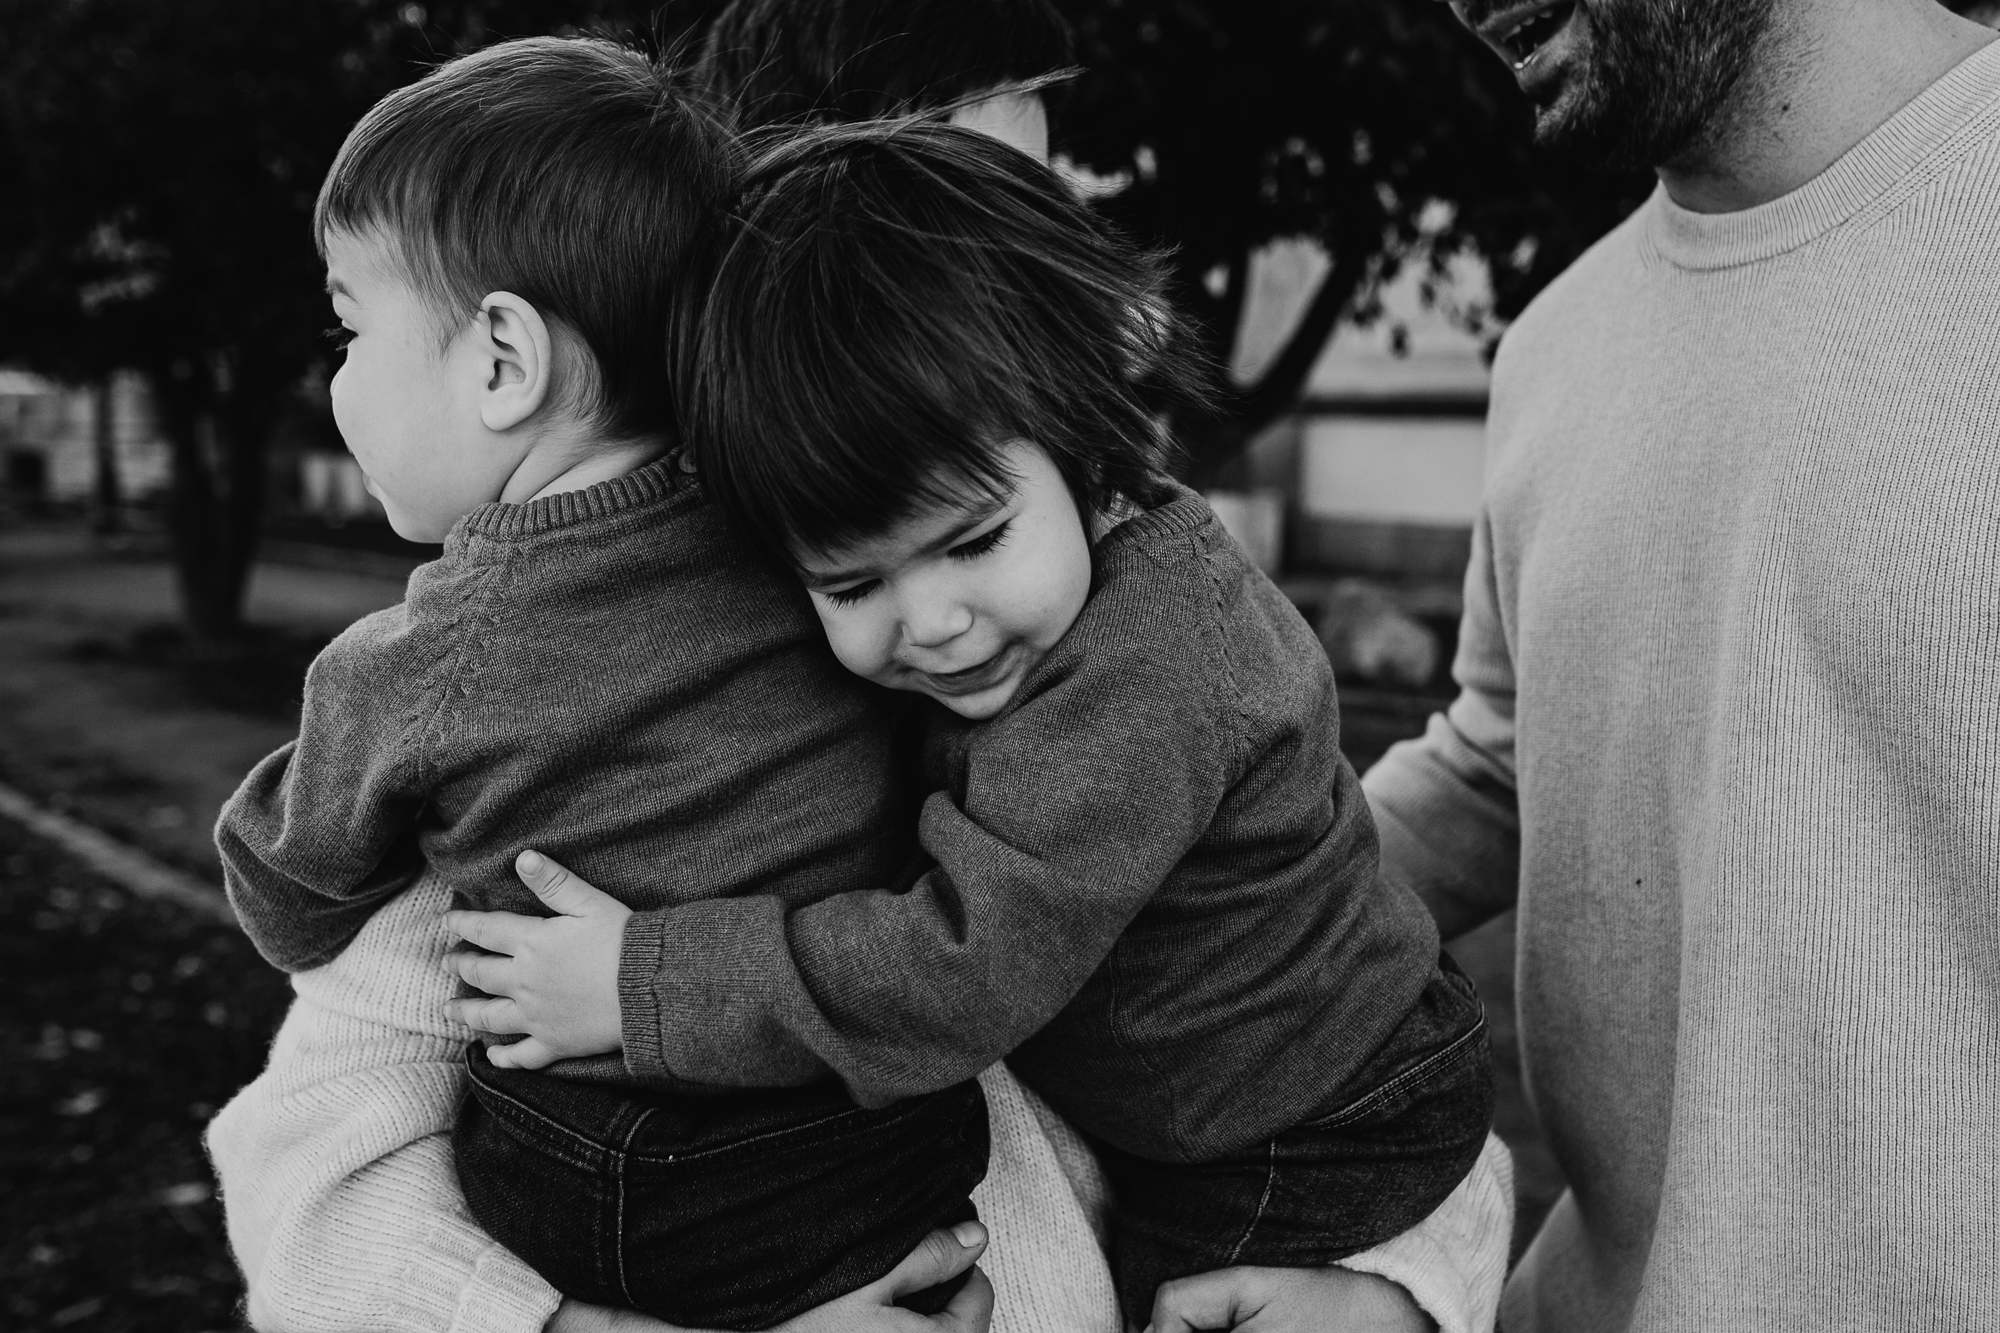 sesion fotos infantil barcelona ciudadela